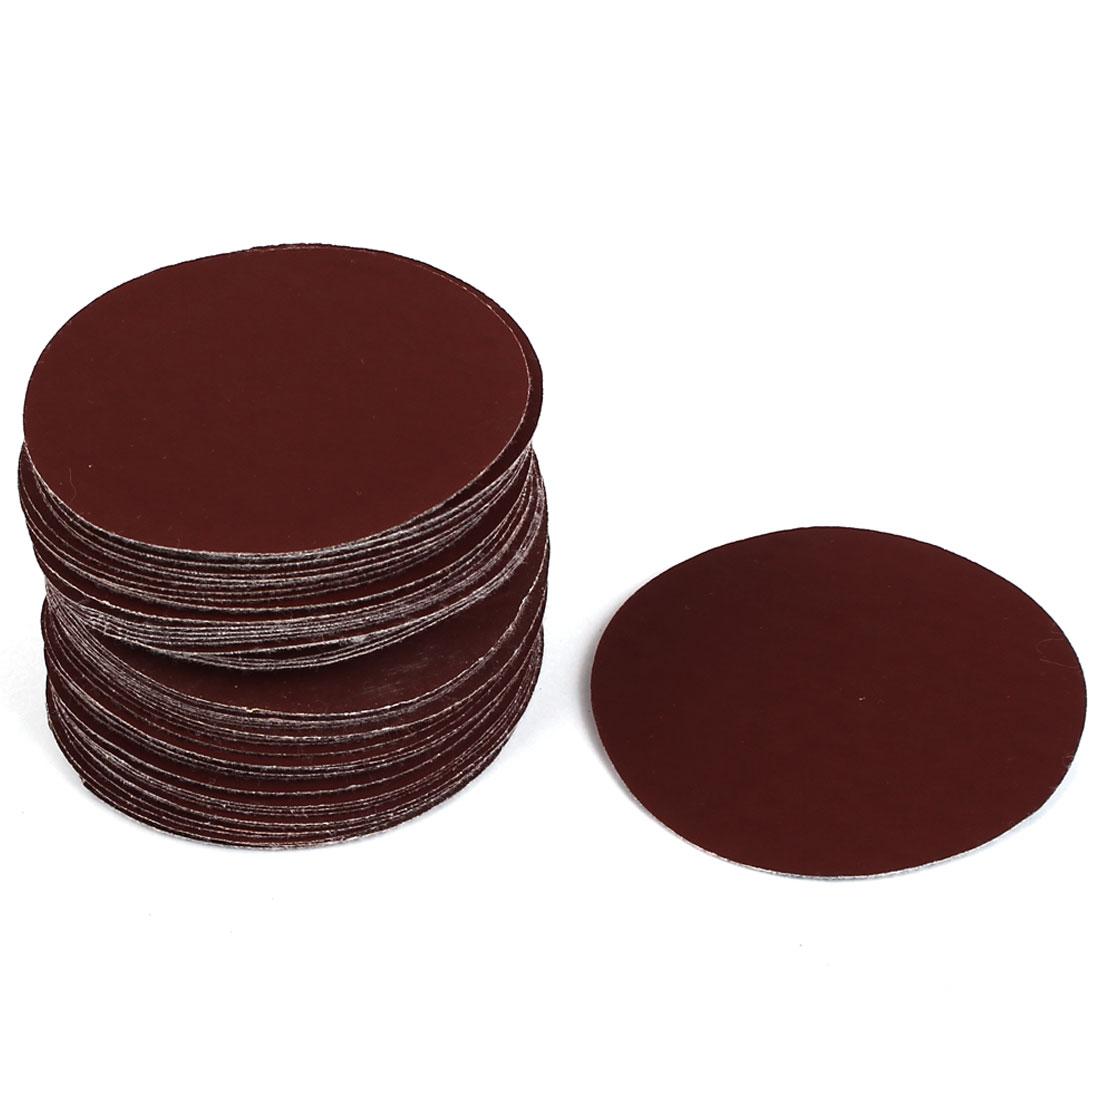 "Grinding Polishing Sanding Disc Flocking Sandpaper 1200 Grit 3"" Dia 50pcs"